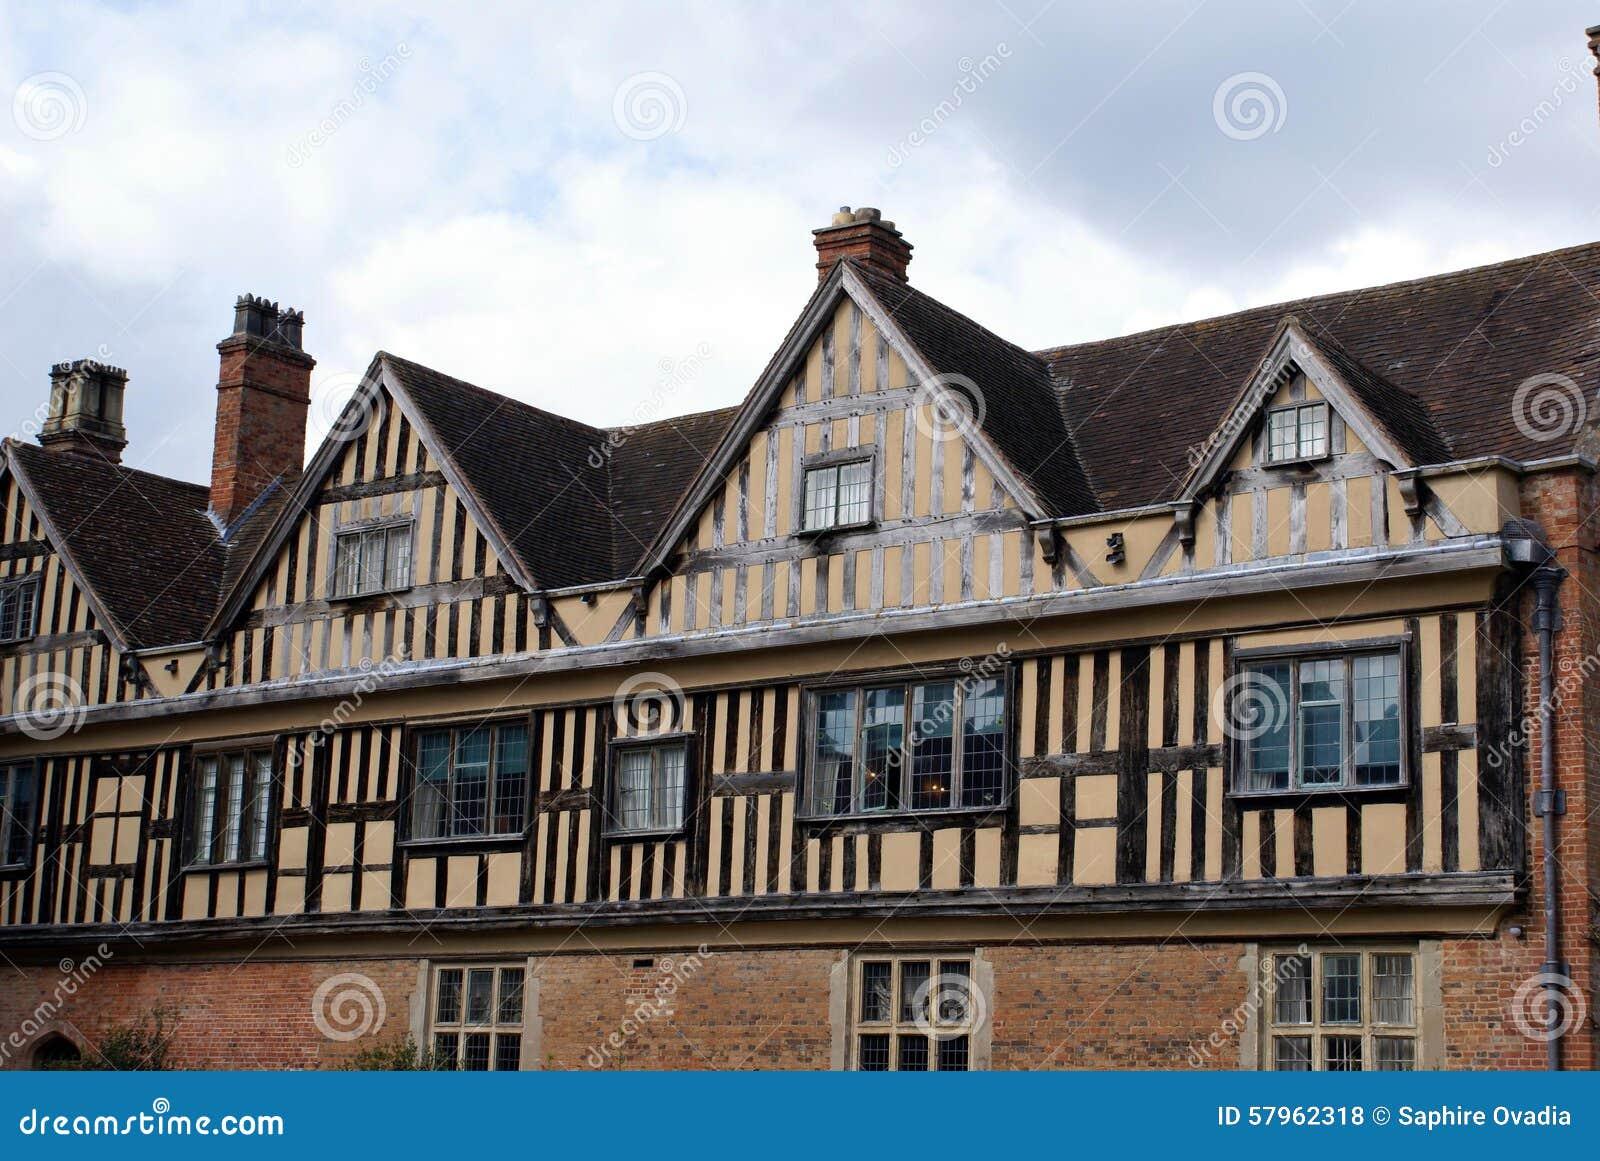 Tudor Windows tudor windows stock photo - image: 57962318